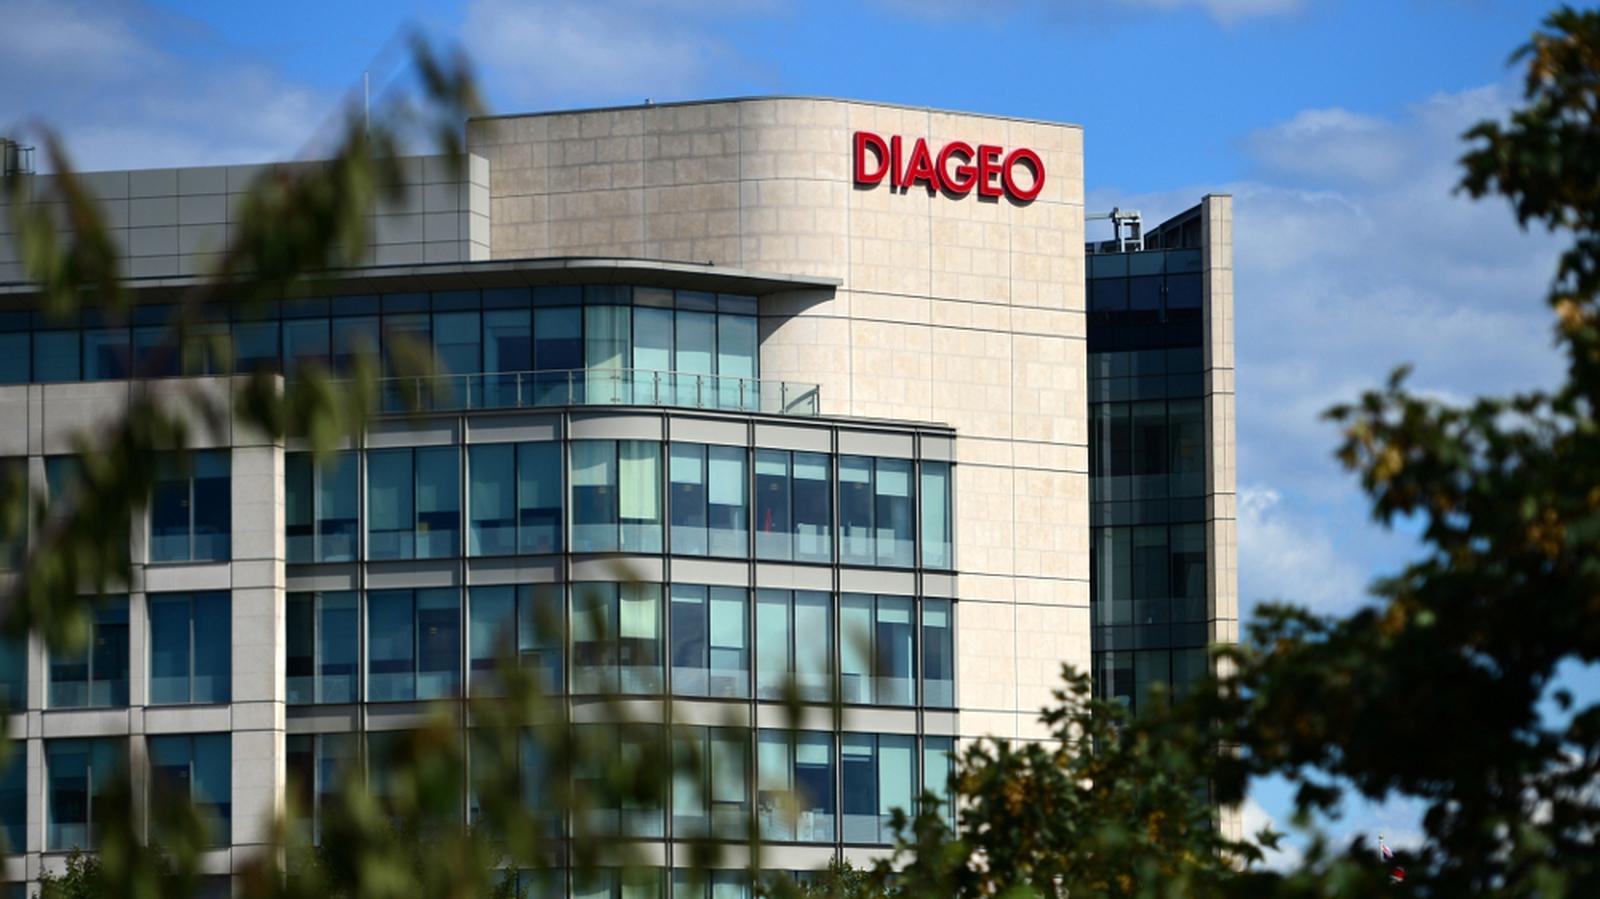 Diageo sees coronavirus hit to 2020 profit of £200m